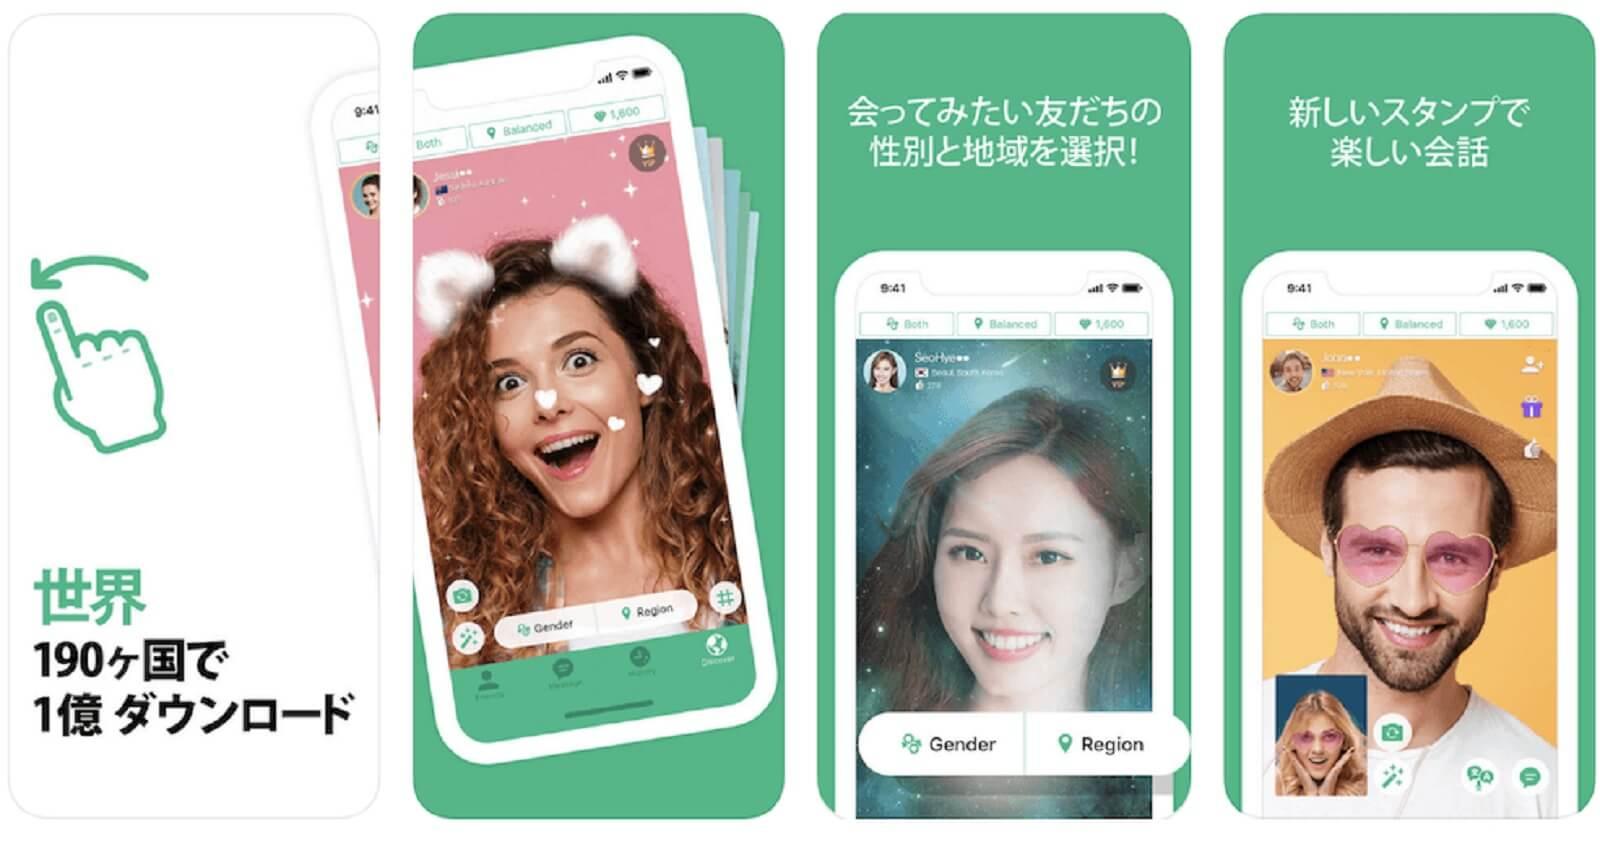 Azar、アプリで異文化交流できる画期的ビデオチャット